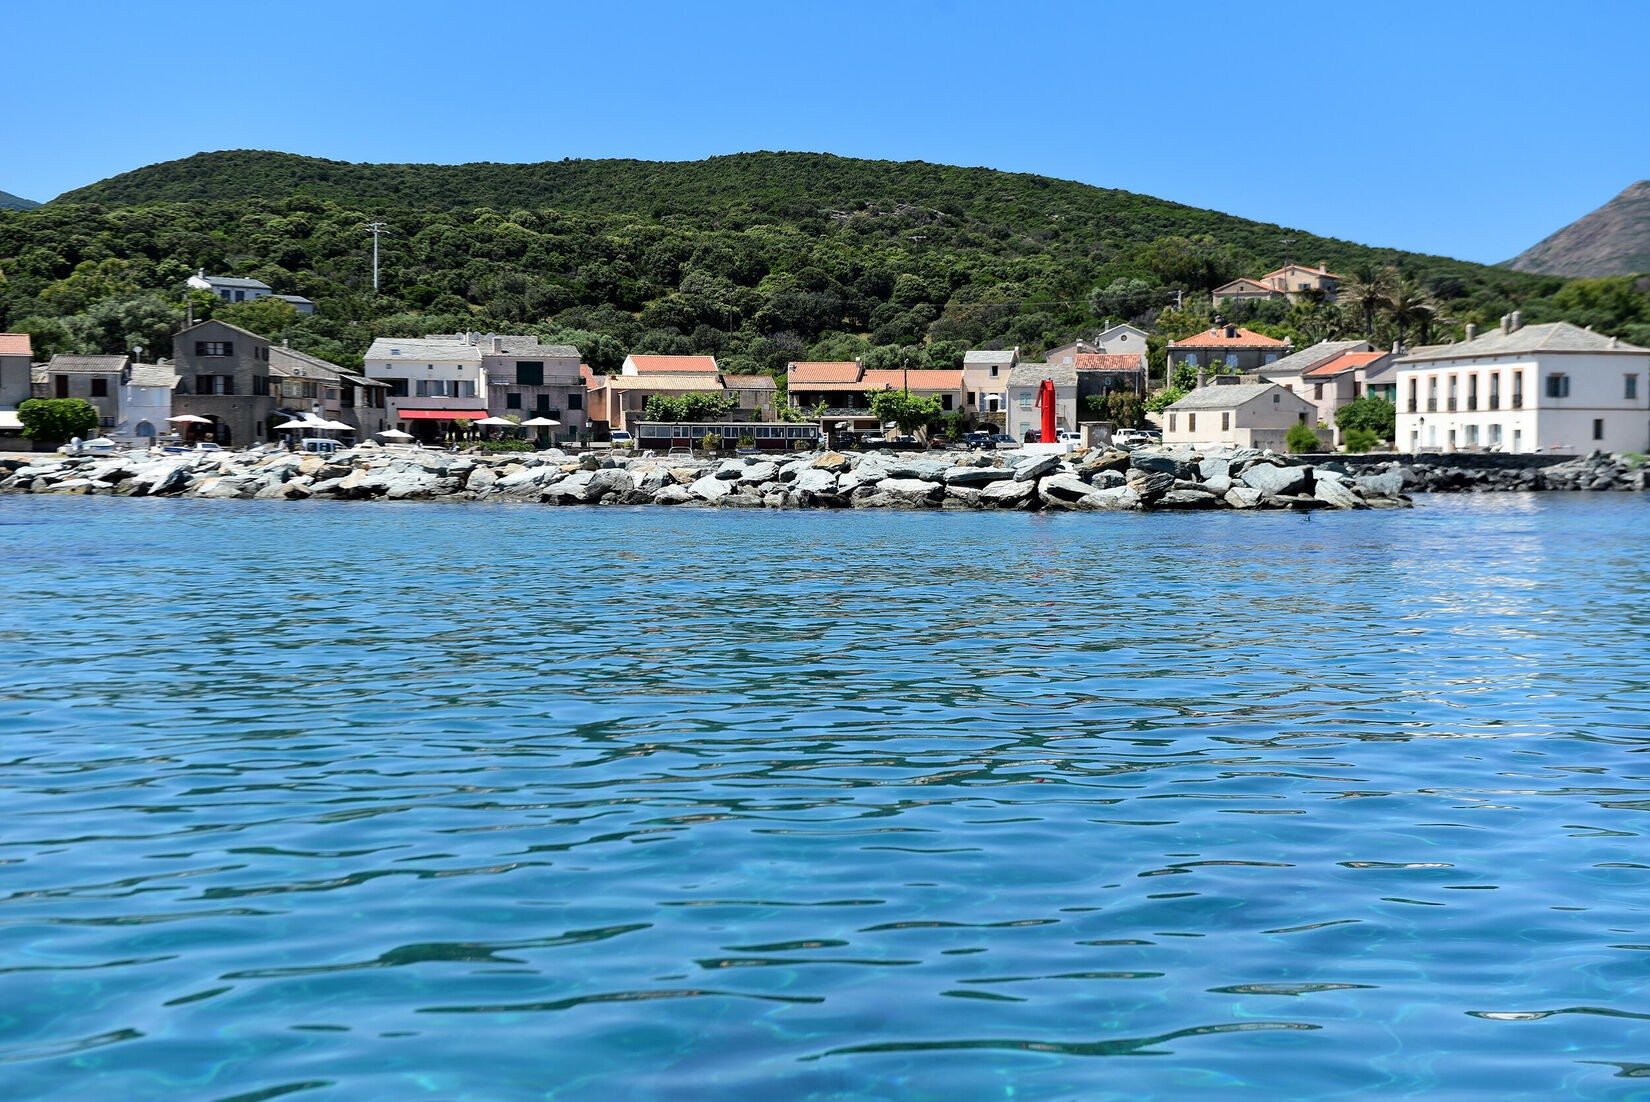 Barcaggio - Marine d\' Ersa - Cap Corse